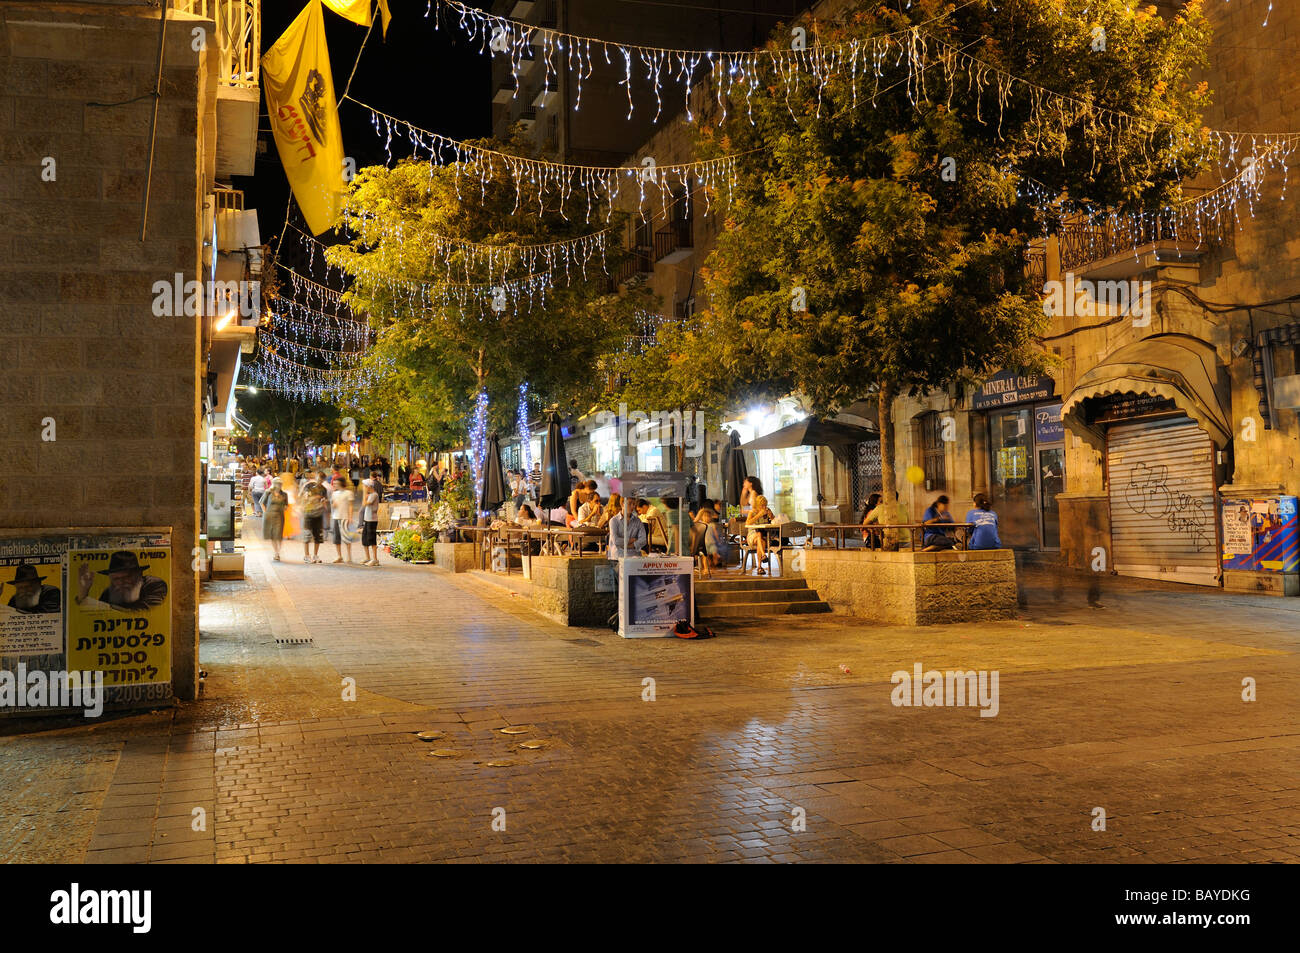 Jerusalem Ben Street Yehuda High Resolution Stock Photography And Images Alamy